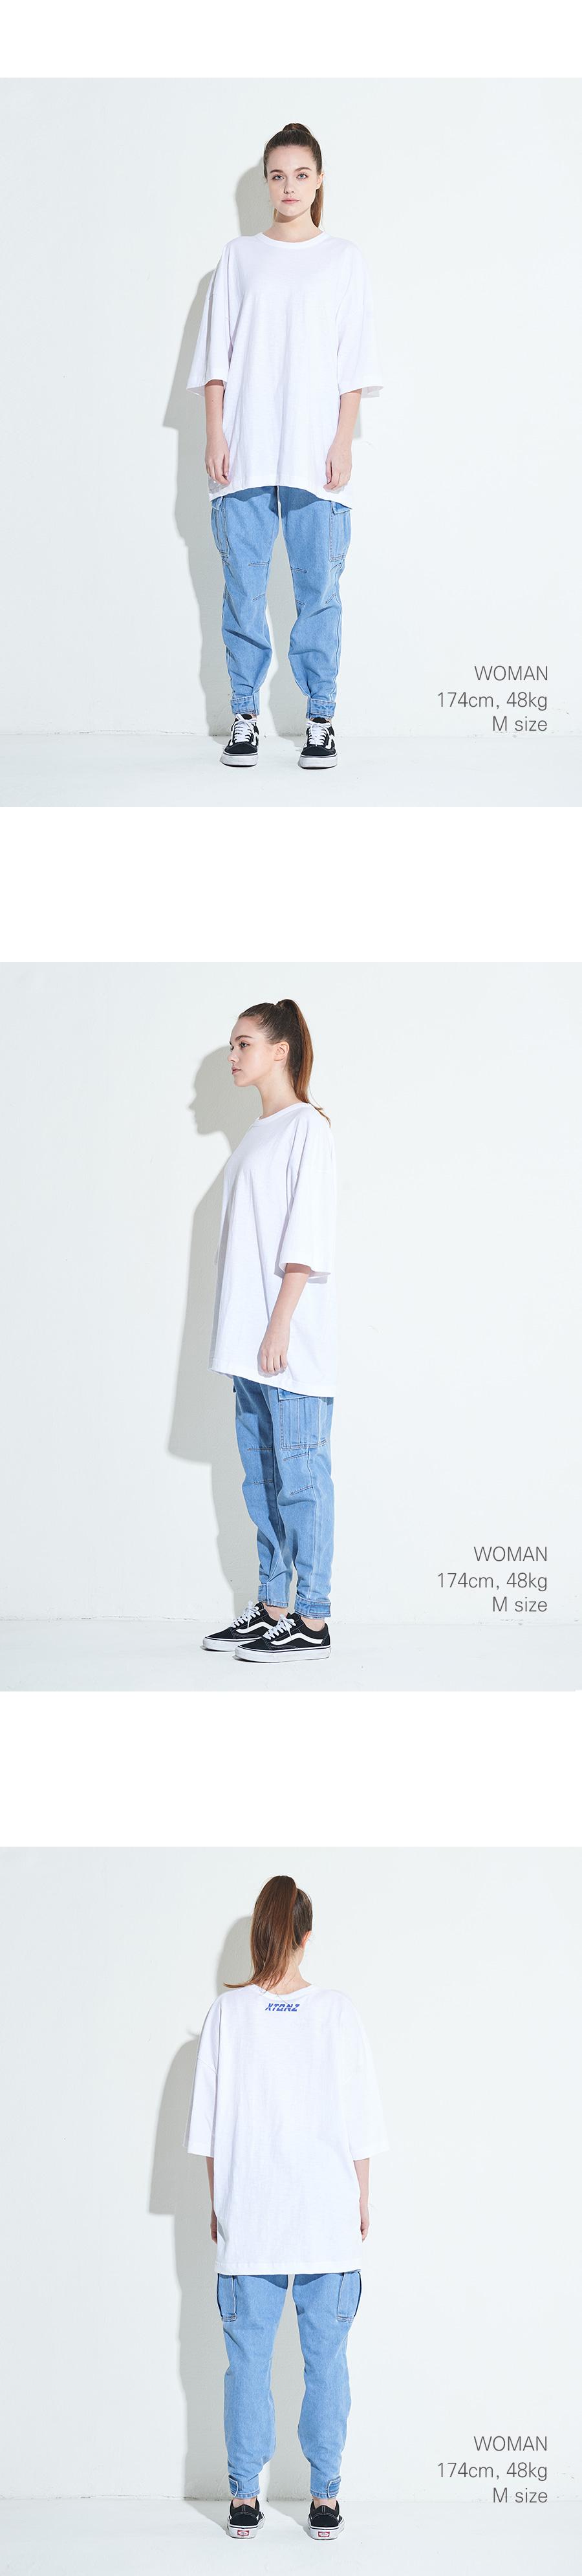 xtt007_wh_woman_1.jpg